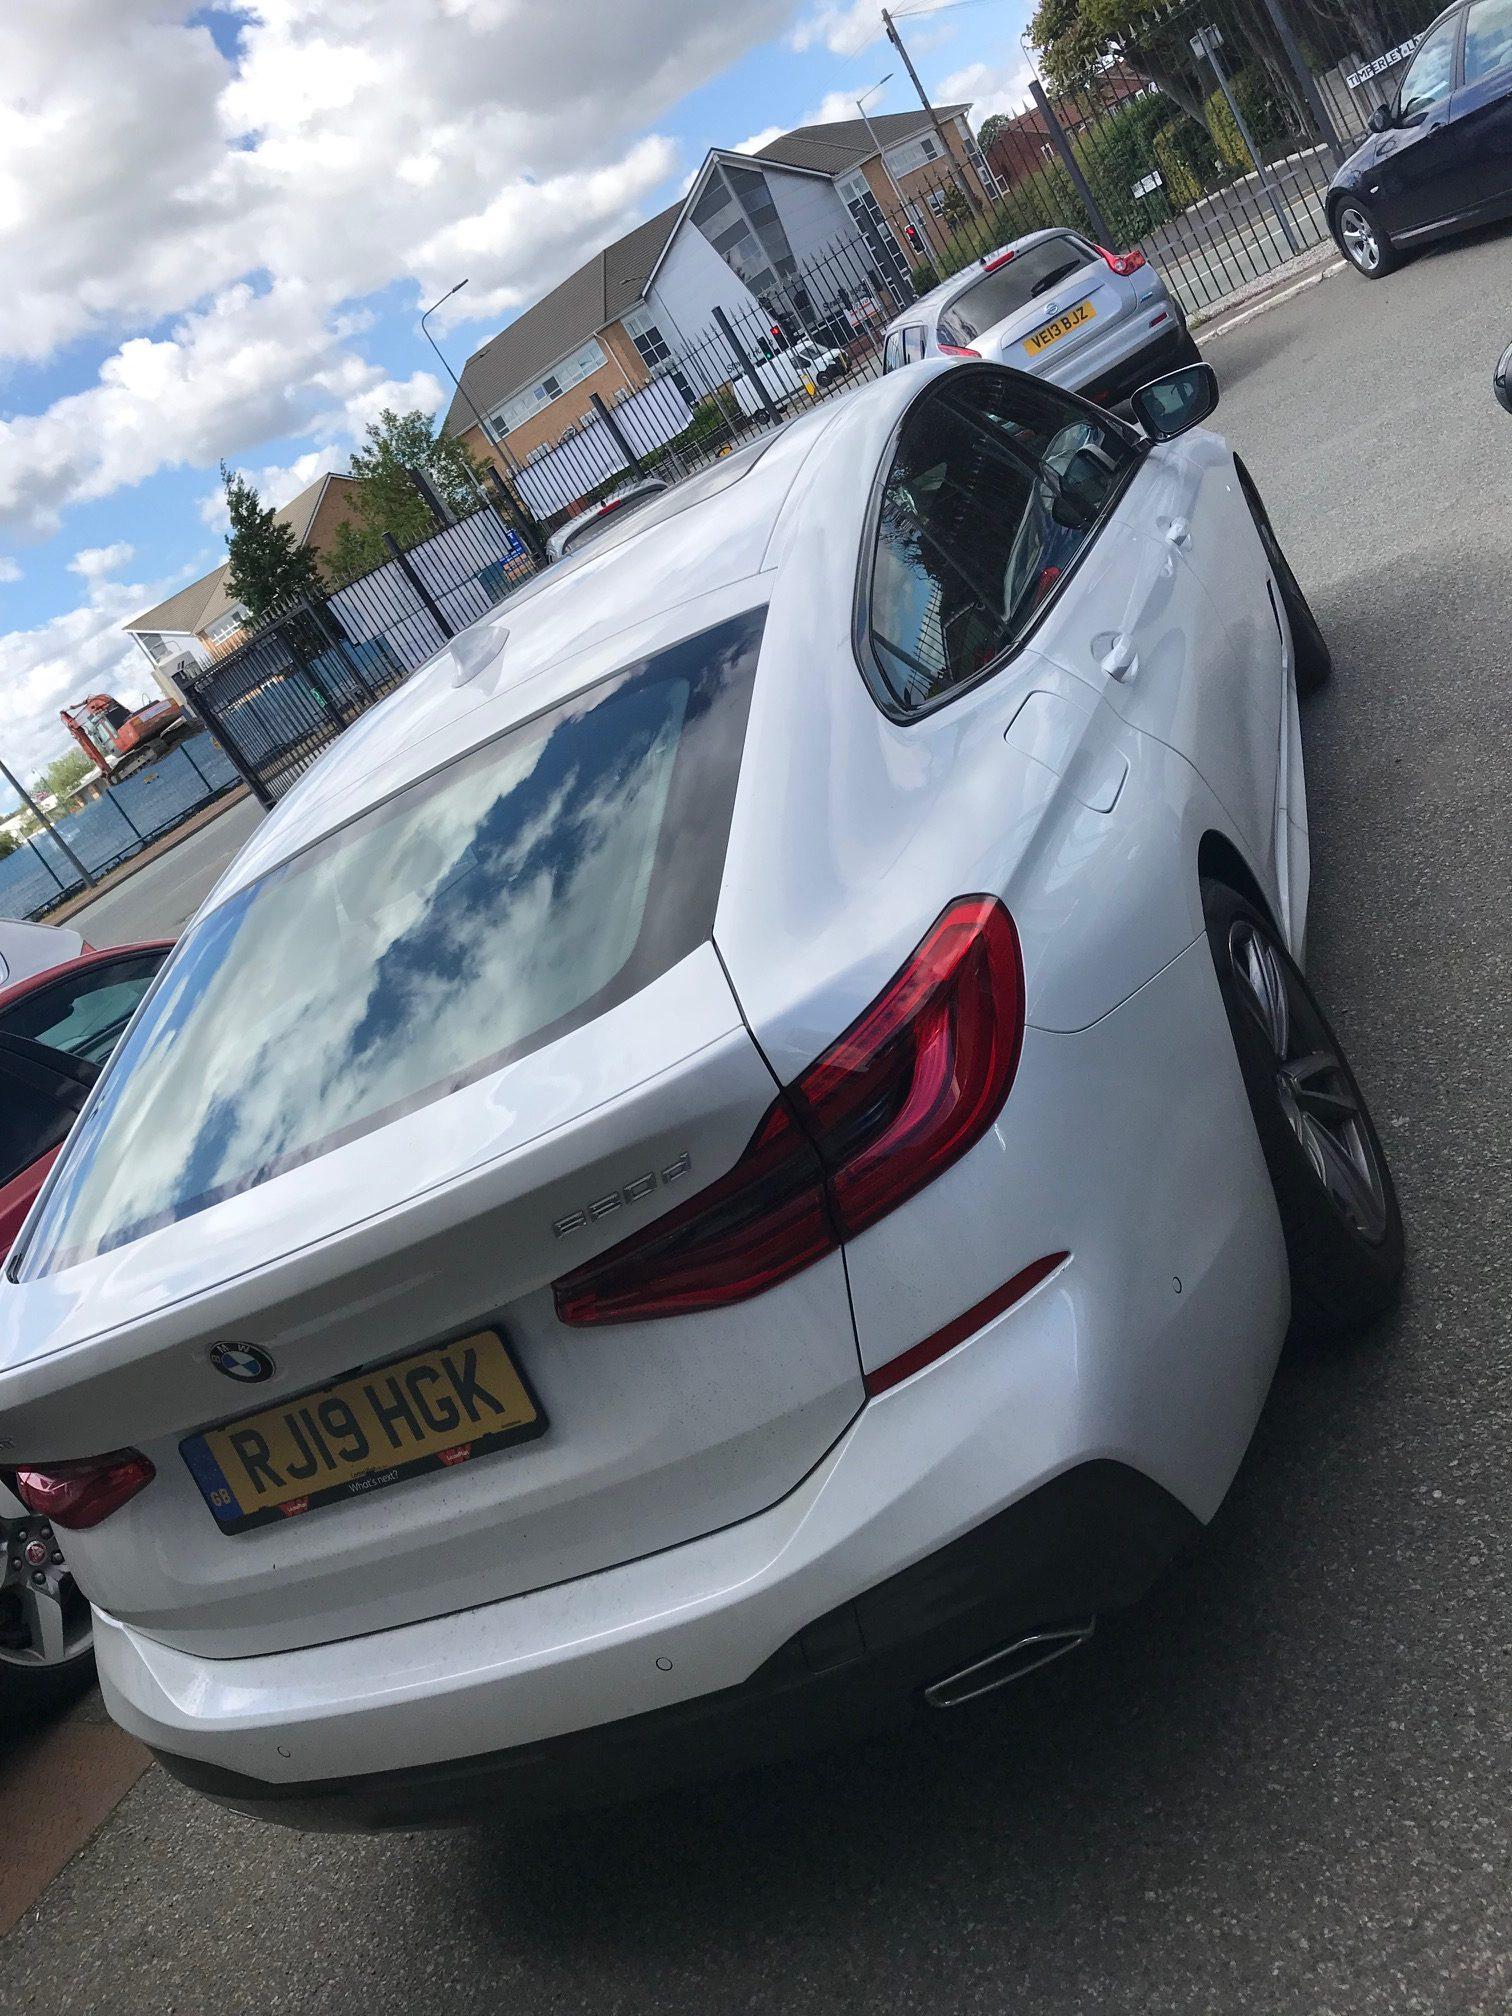 BMW 6 SERIES GRAN TURISMO DIESEL HATCHBACK 620d M Sport 5dr Auto Car Leasing Best Offers